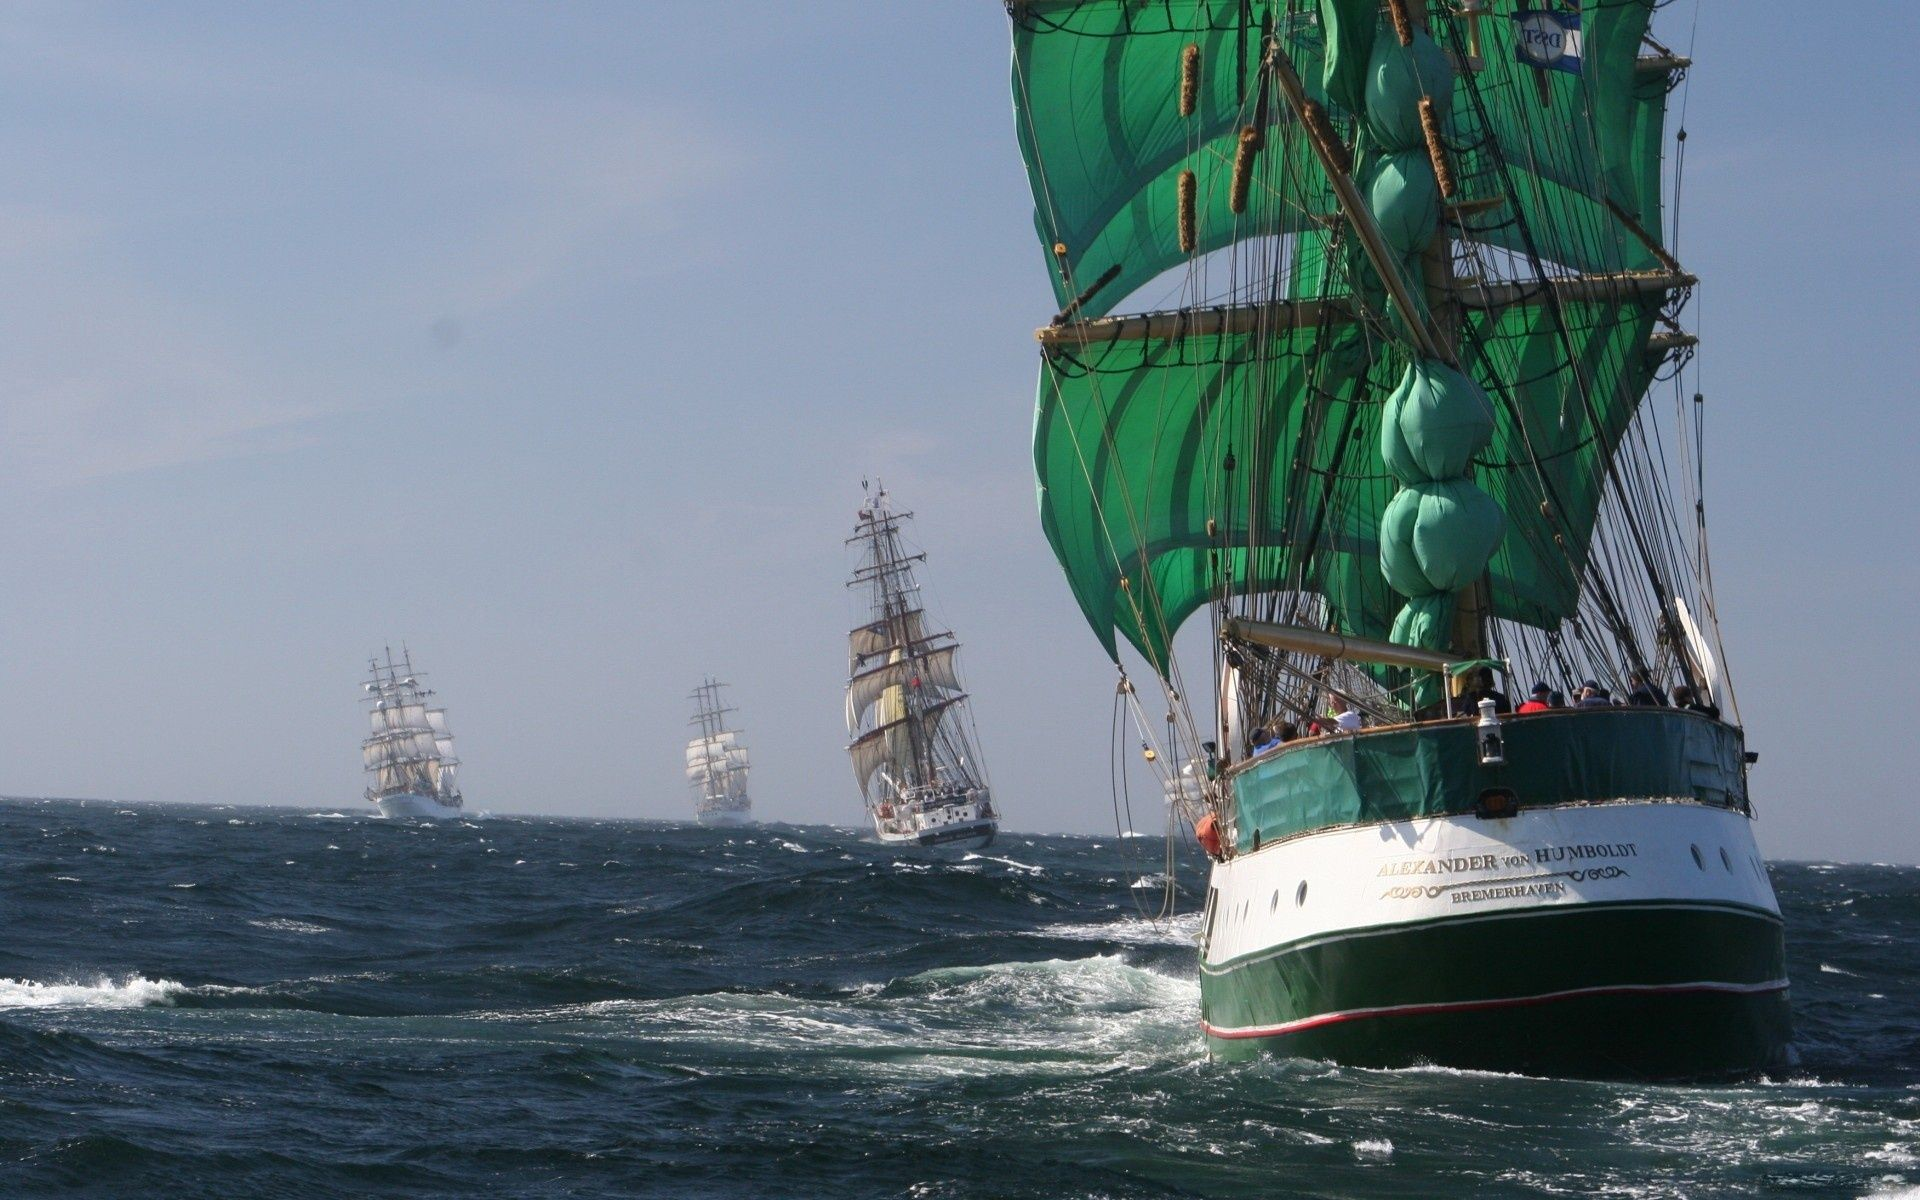 sailing-ships-wide.jpg